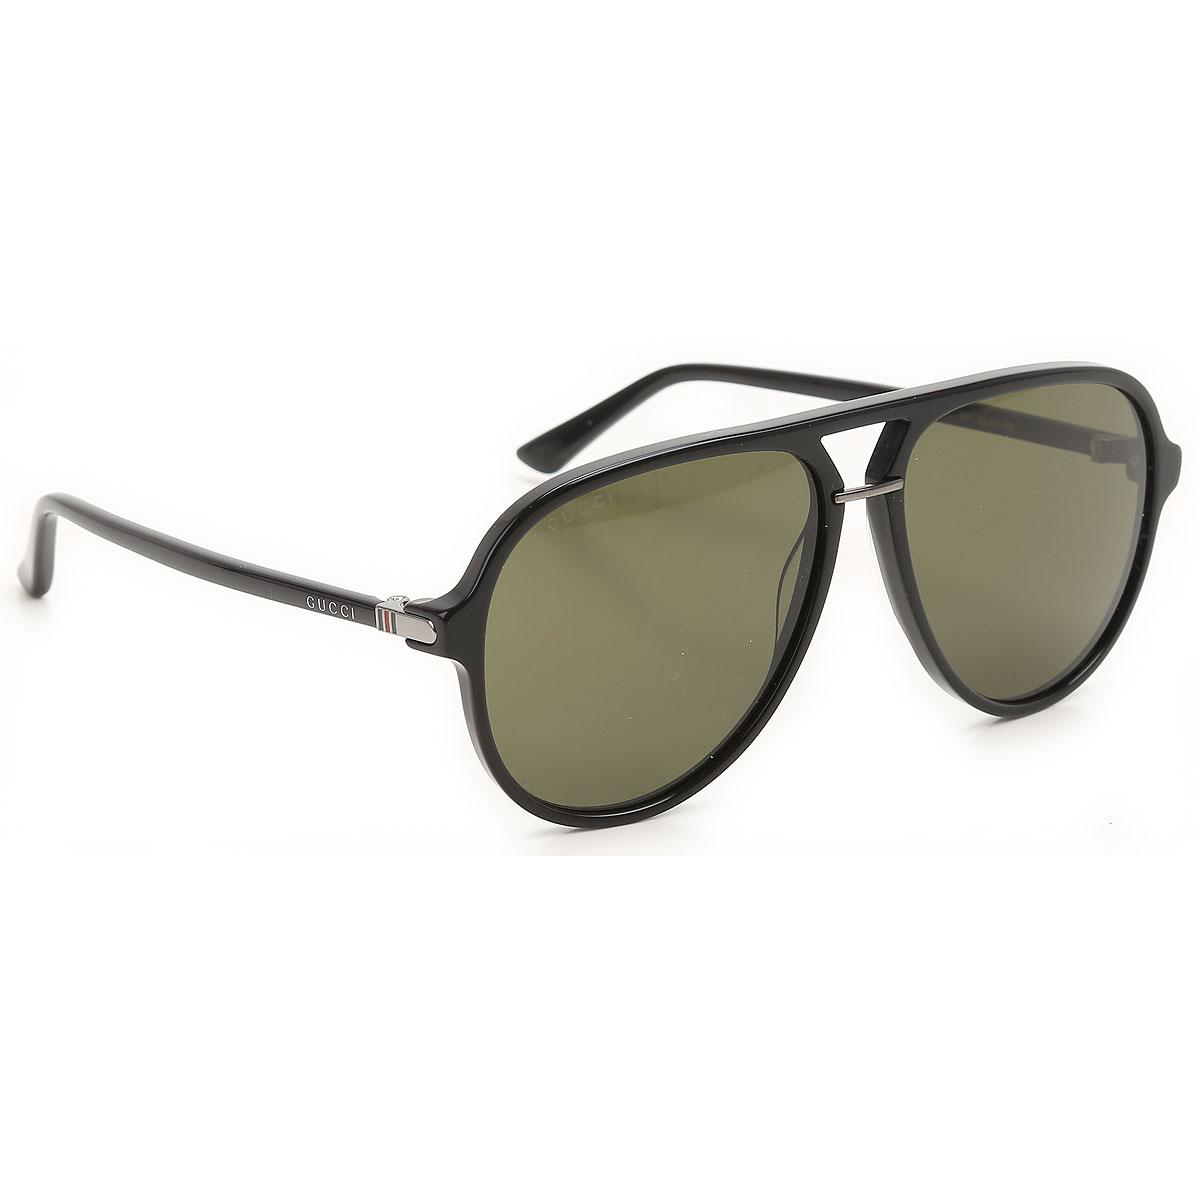 Gafas y Lentes de Sol Gucci, Detalle Modelo: gg0015s-001-